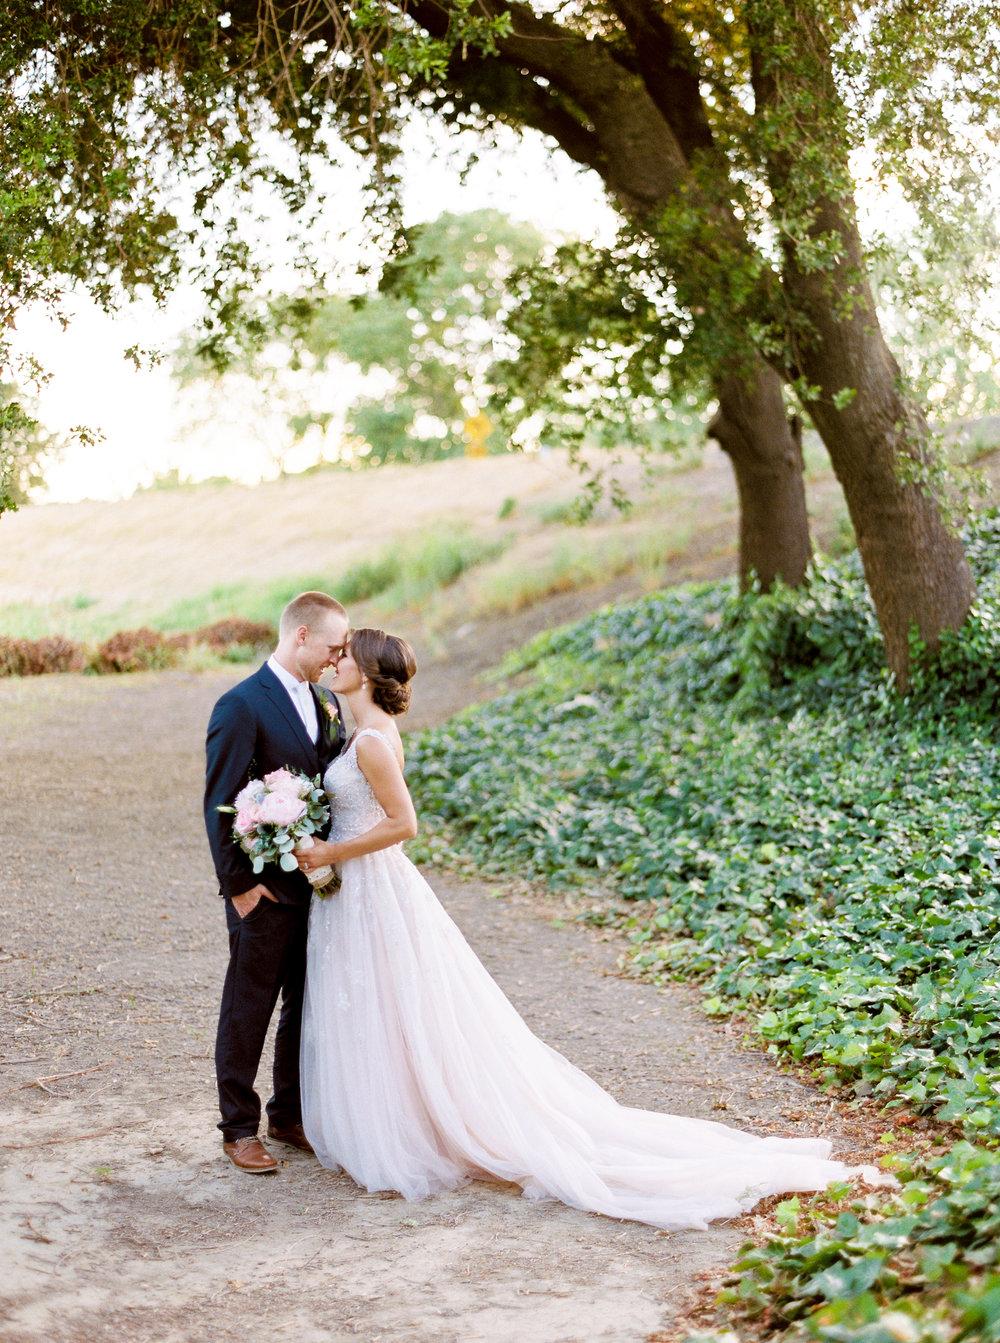 blush-wedding-at-scribner-bend-vineyards-sacramento-california-1-29.jpg